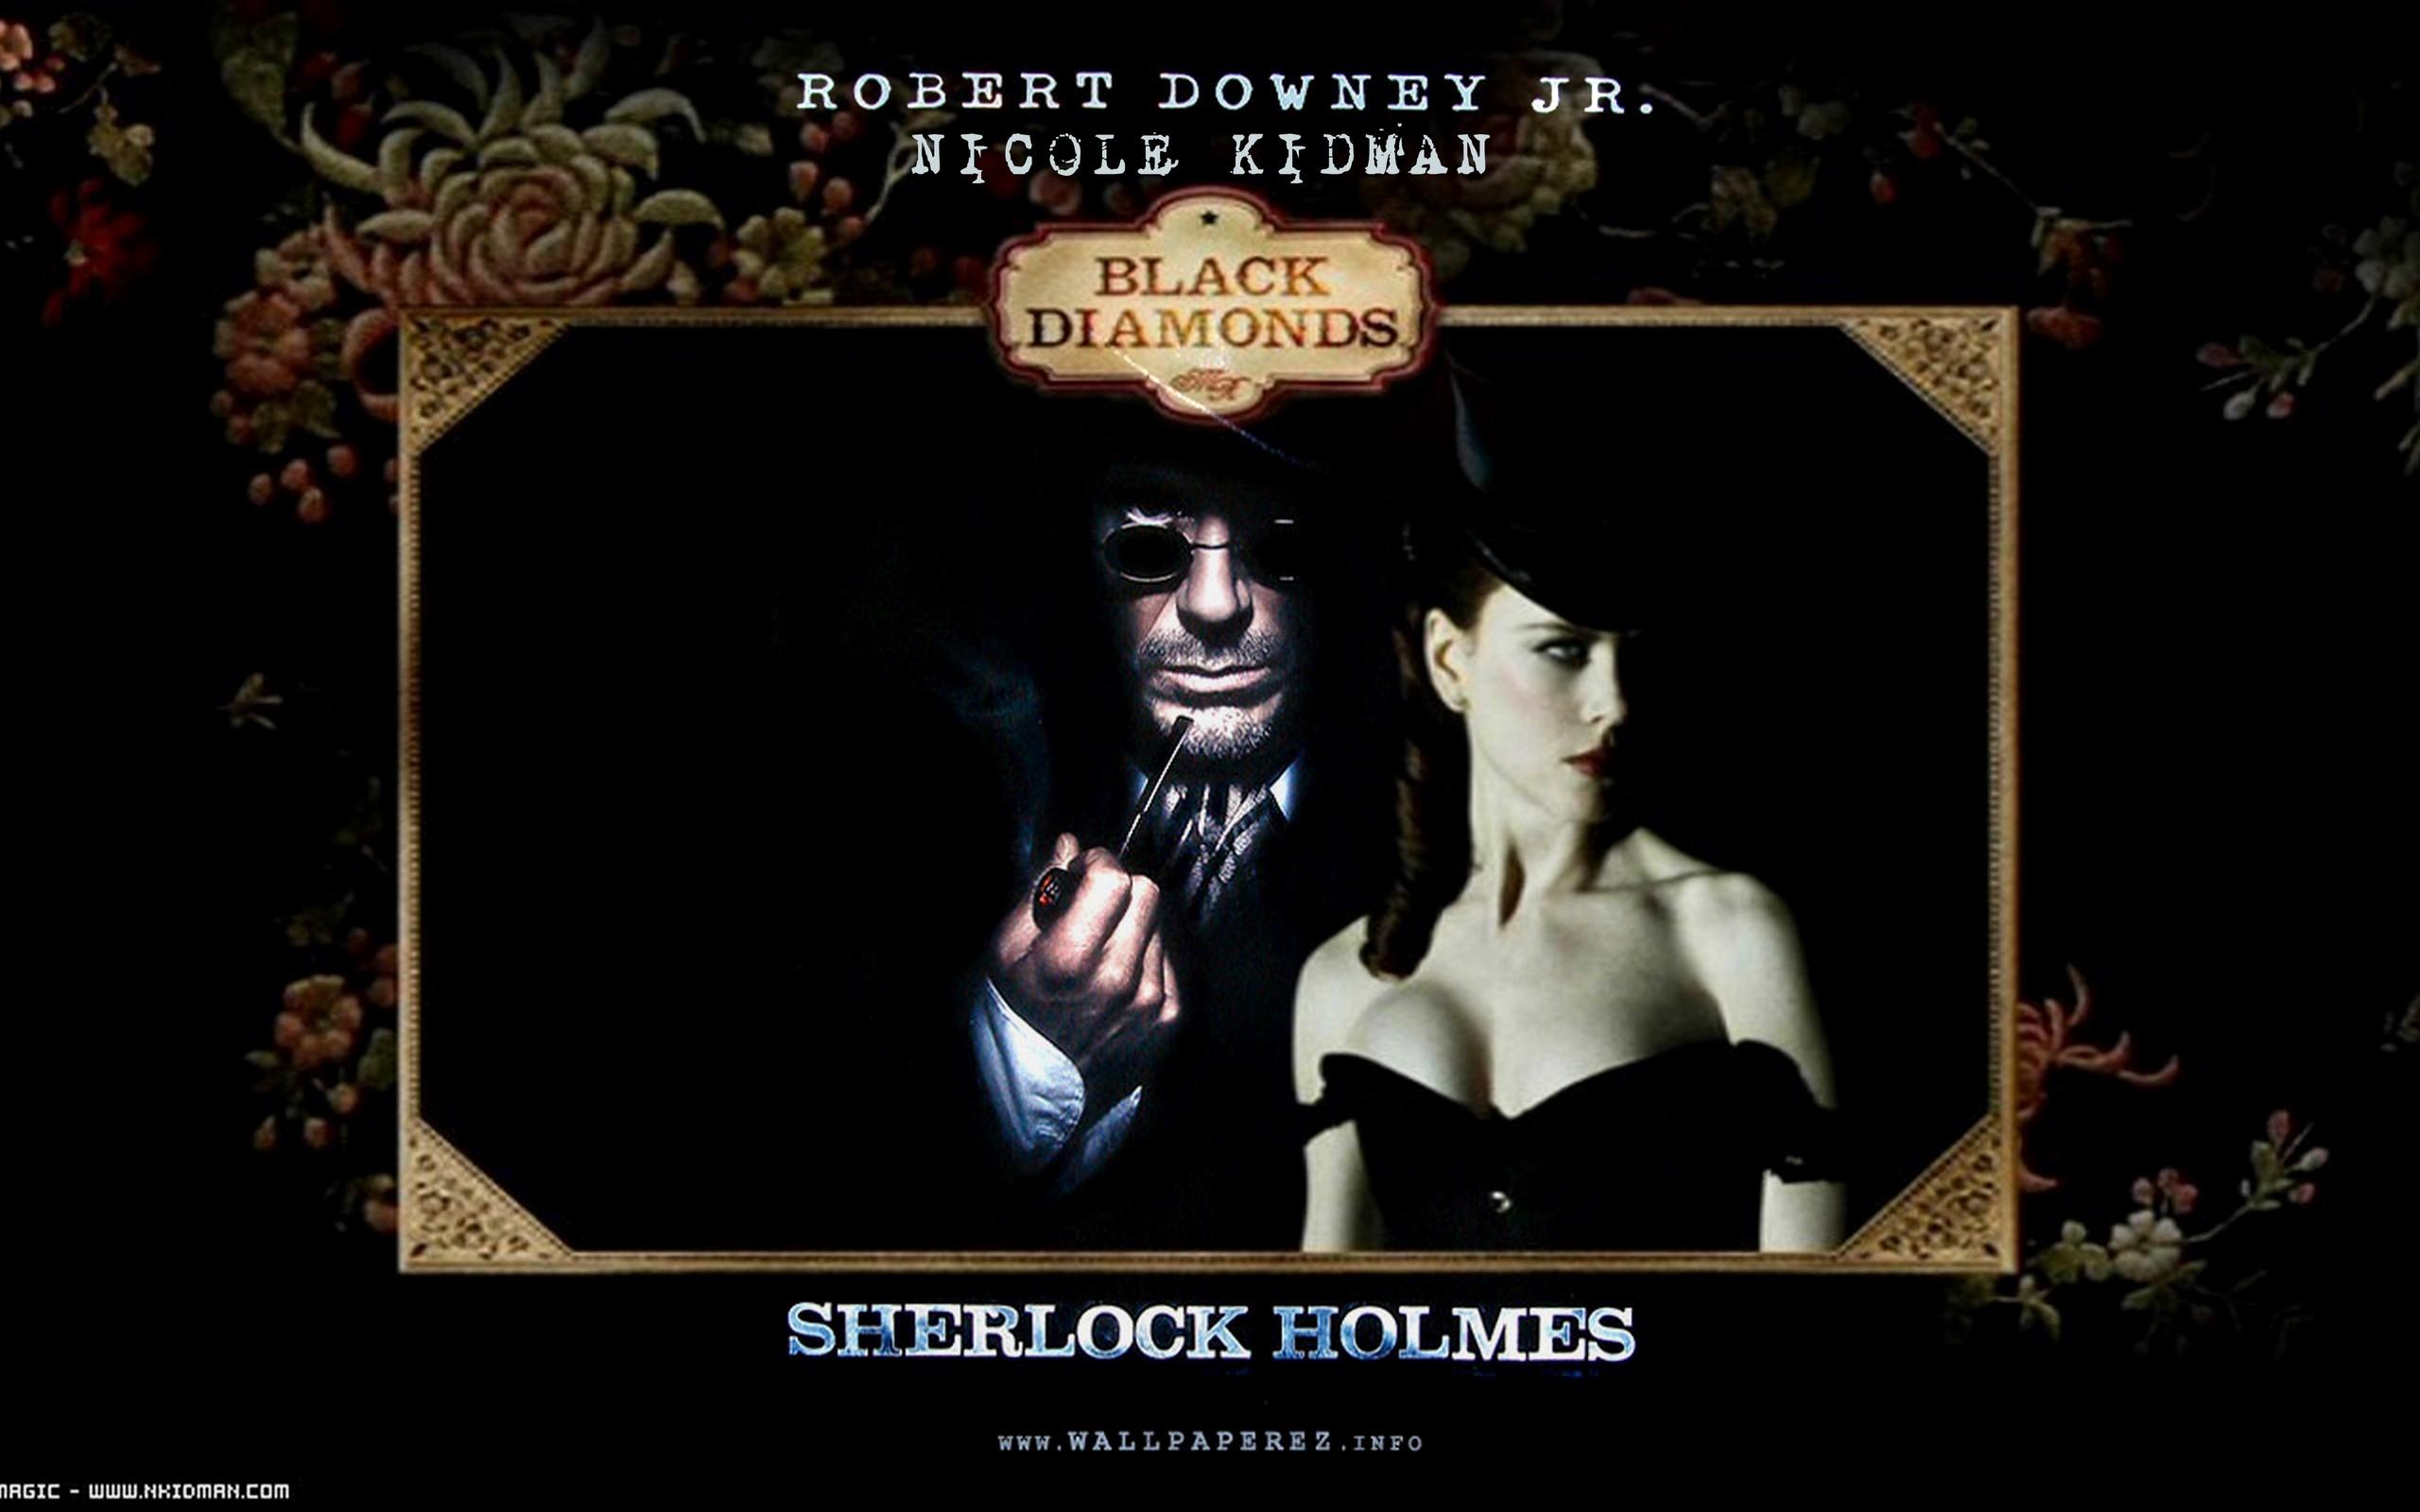 Download Wallpaper Movie Black - Sherlock-Holmes-Black-Diamonds-robert-downey-jr-as-sherlock-holmes-21116657-2560-1600  Picture_846048.jpg